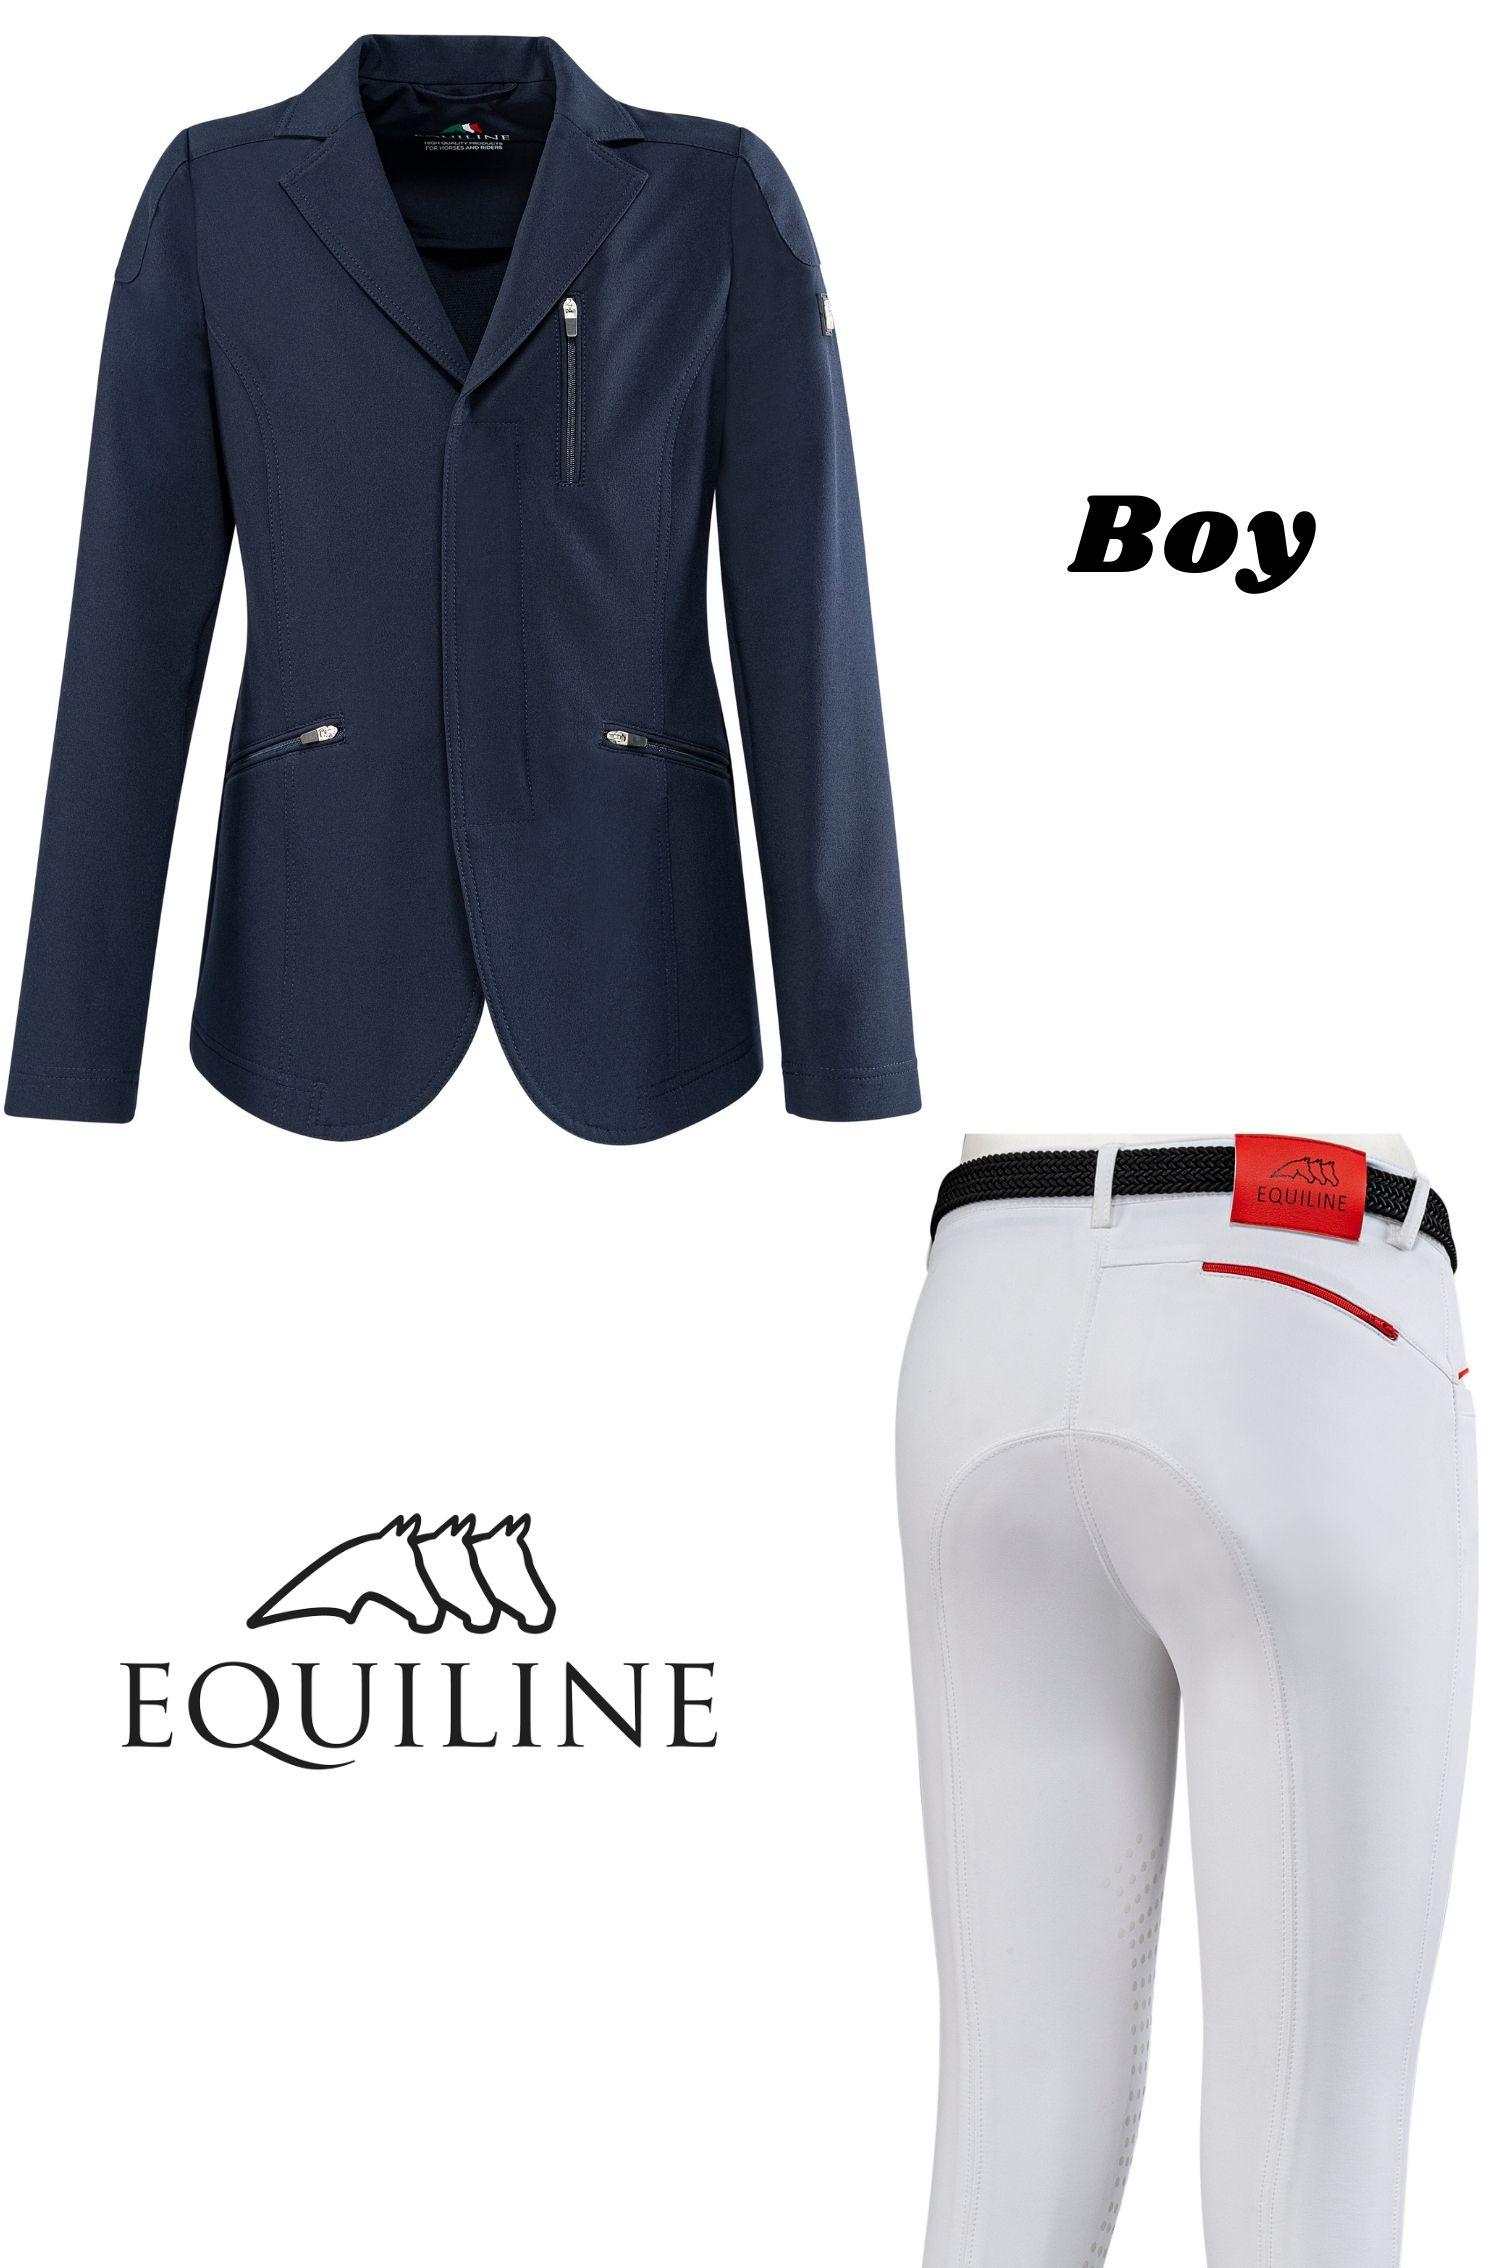 ◆ SALE!◆ EQUILINE ジュニア用競技ウエア2点セット(エクイライン・男の子用/10-11)